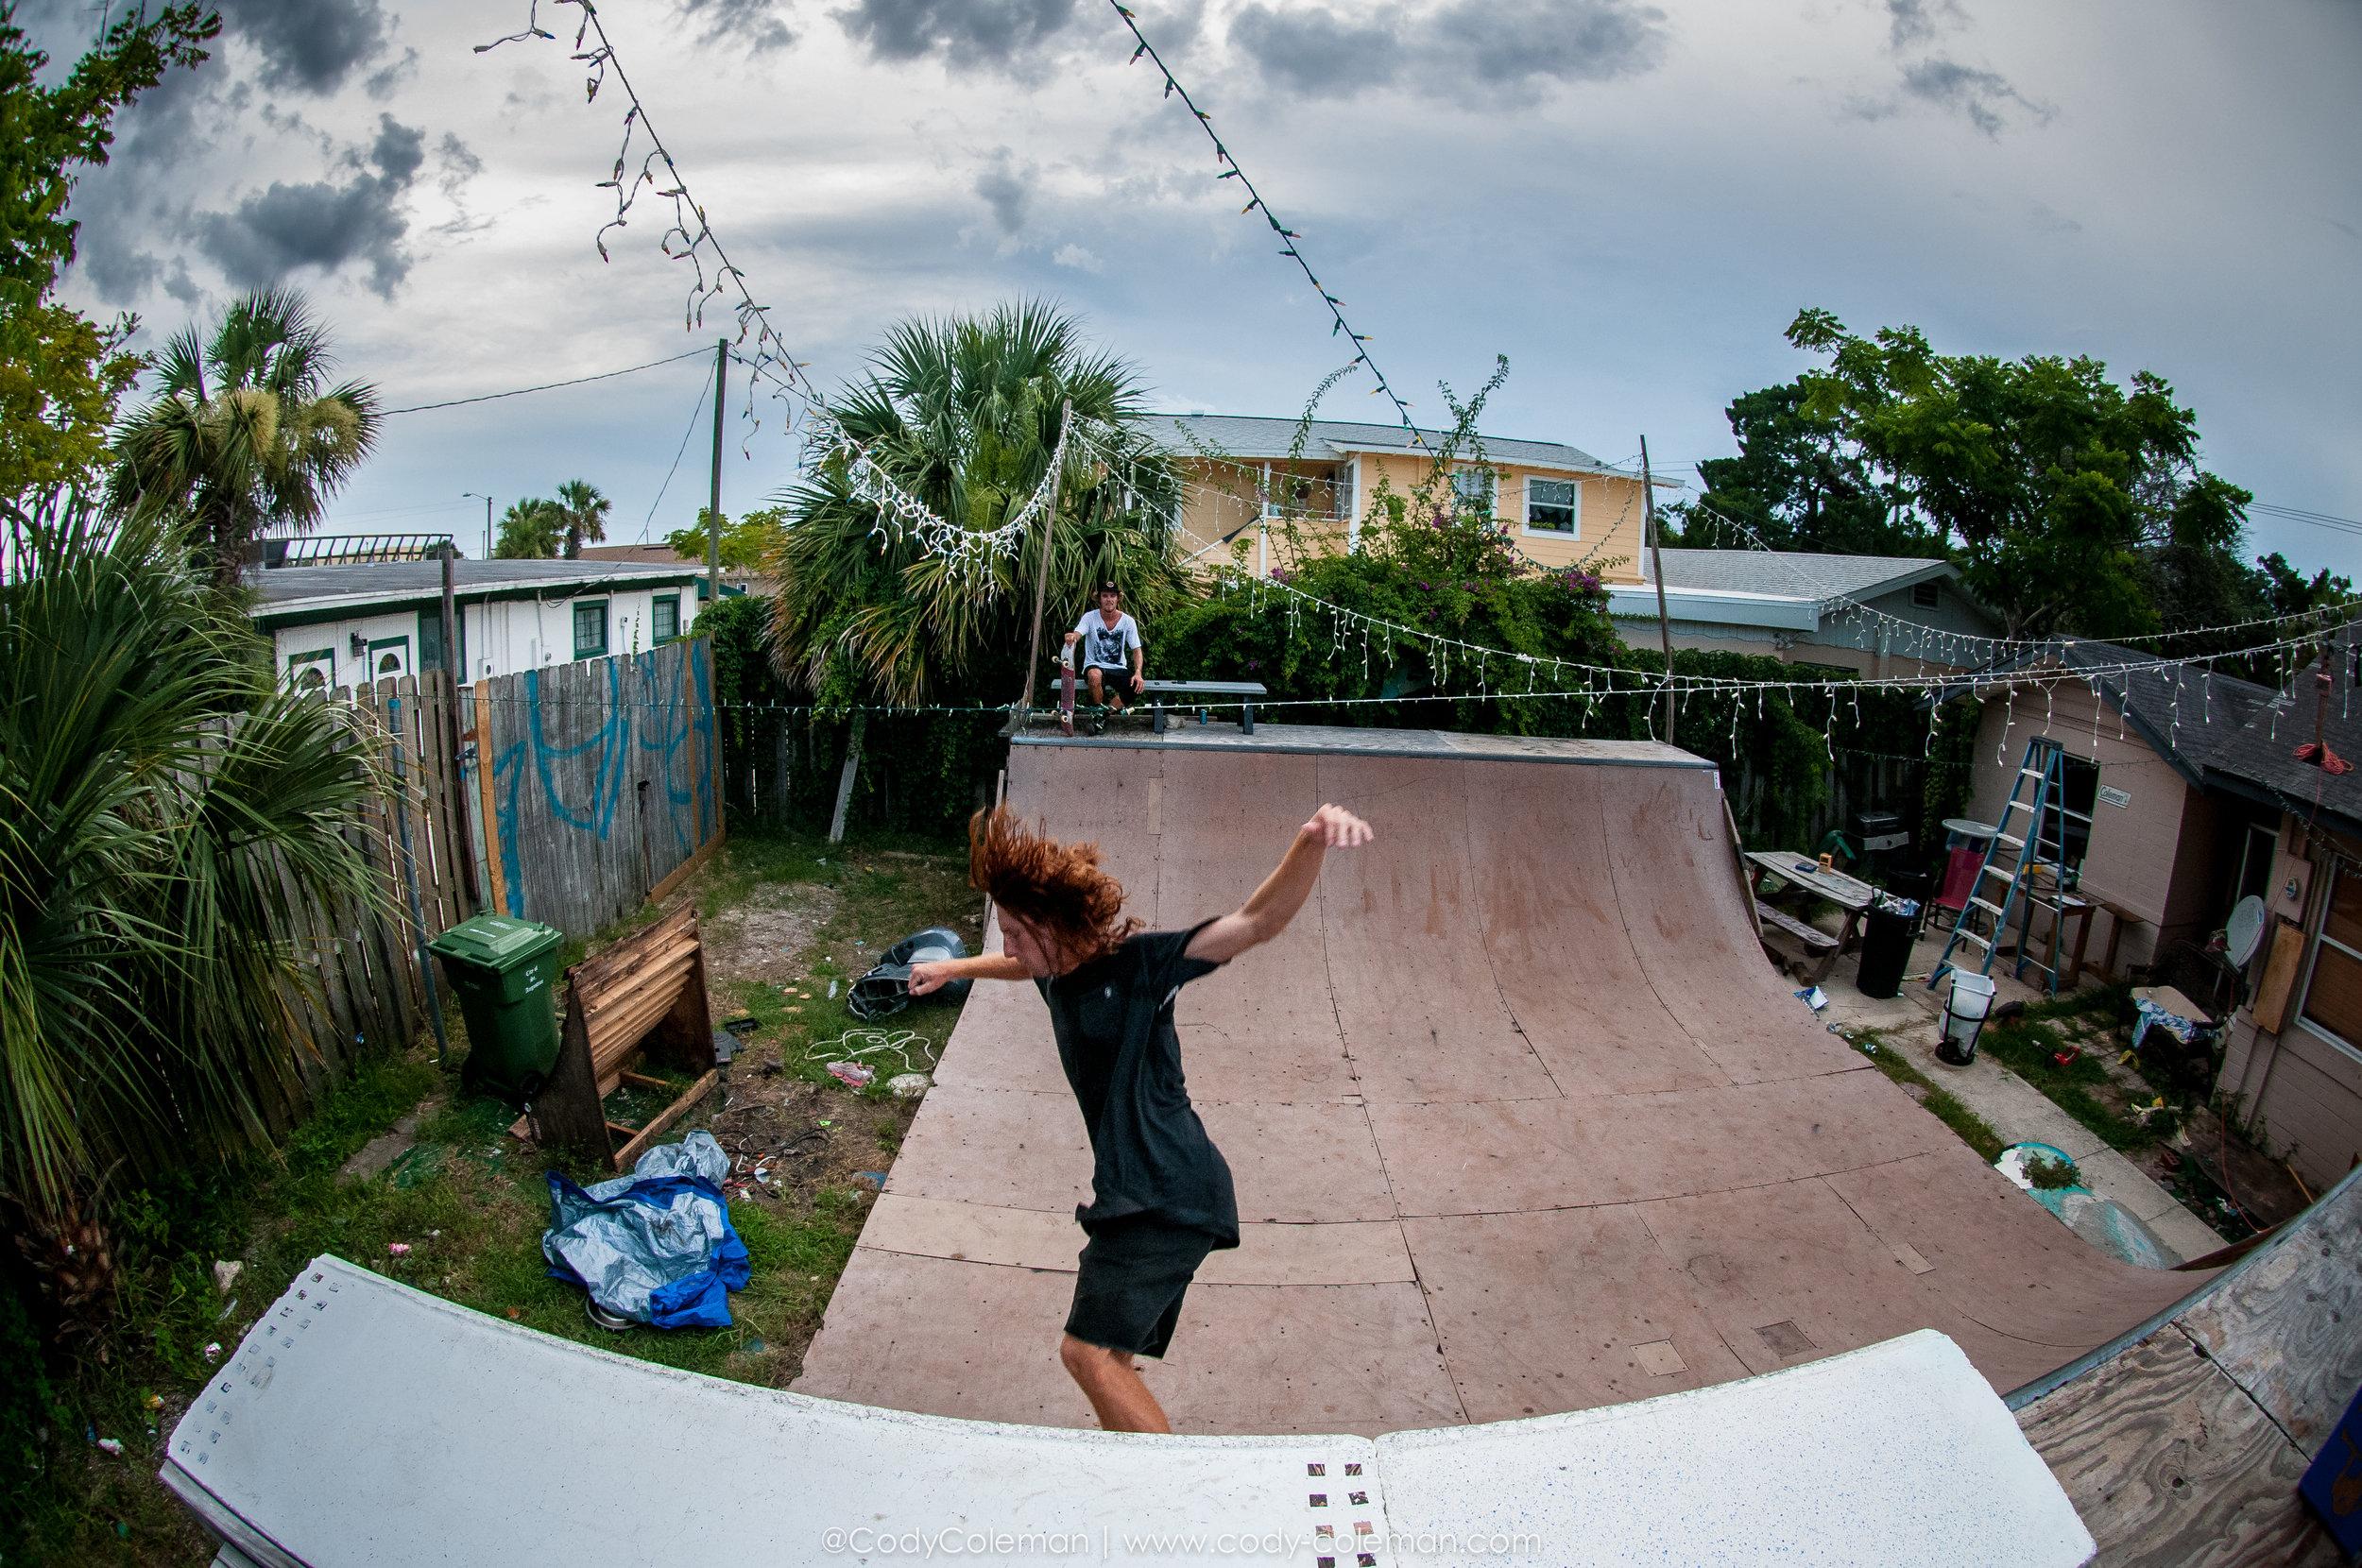 BackyardBozos_Photo_Coleman-26.jpg